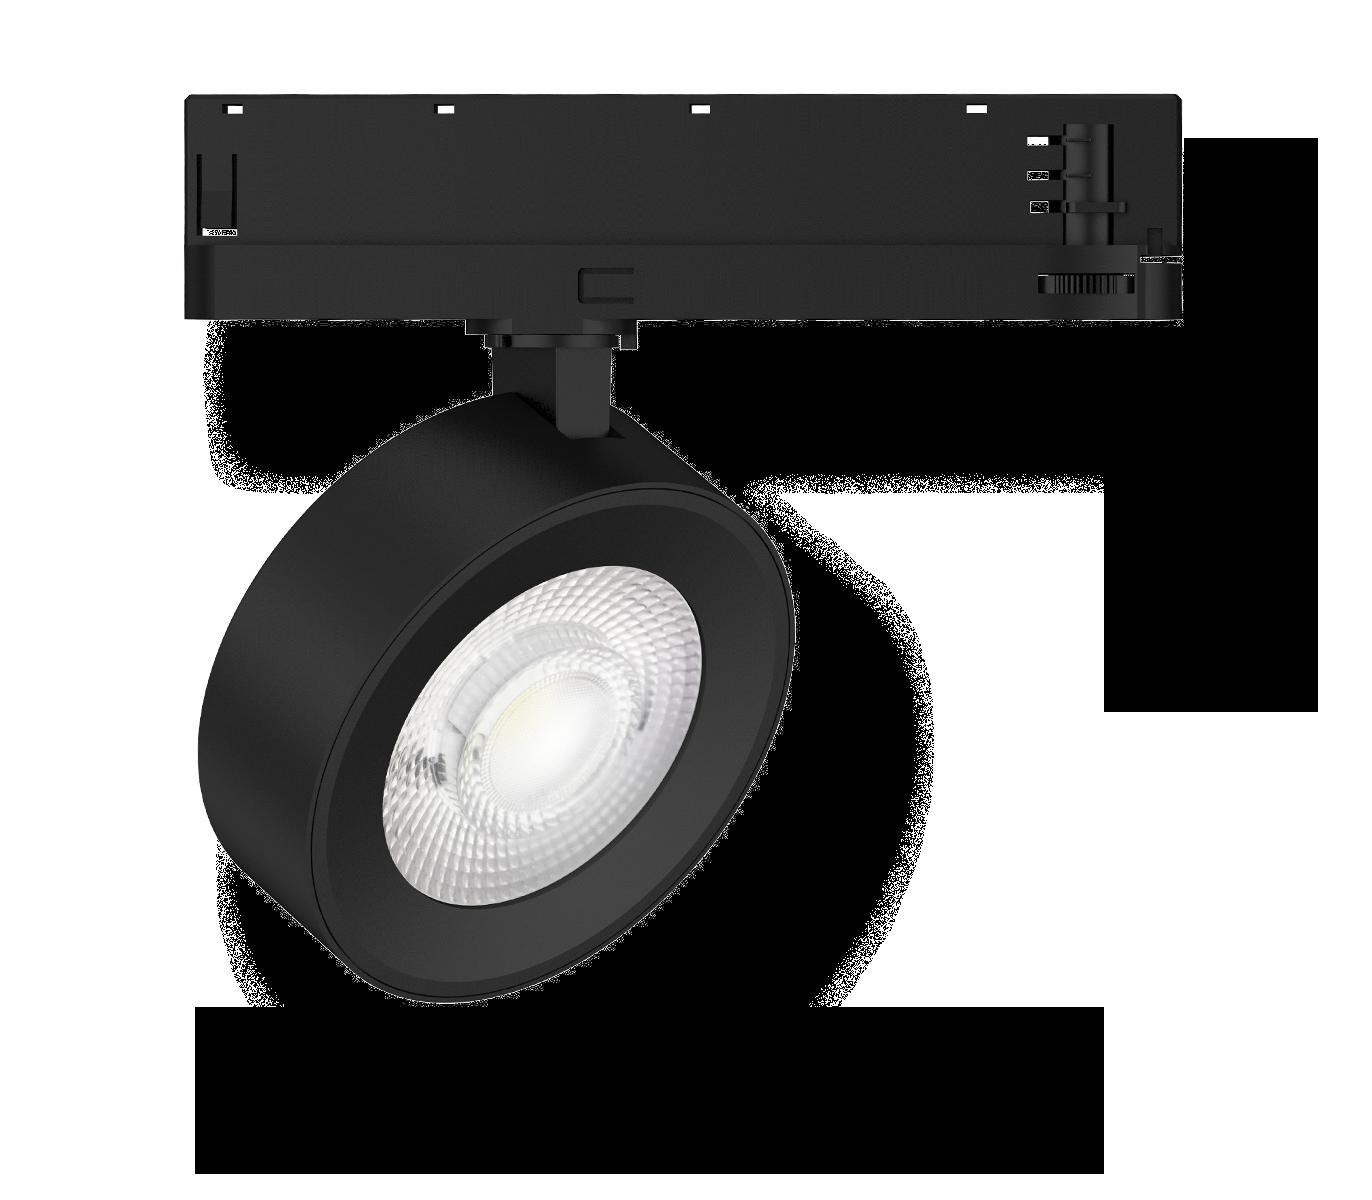 sinski reflektor, šinski reflektor, track light, šinska rasveta